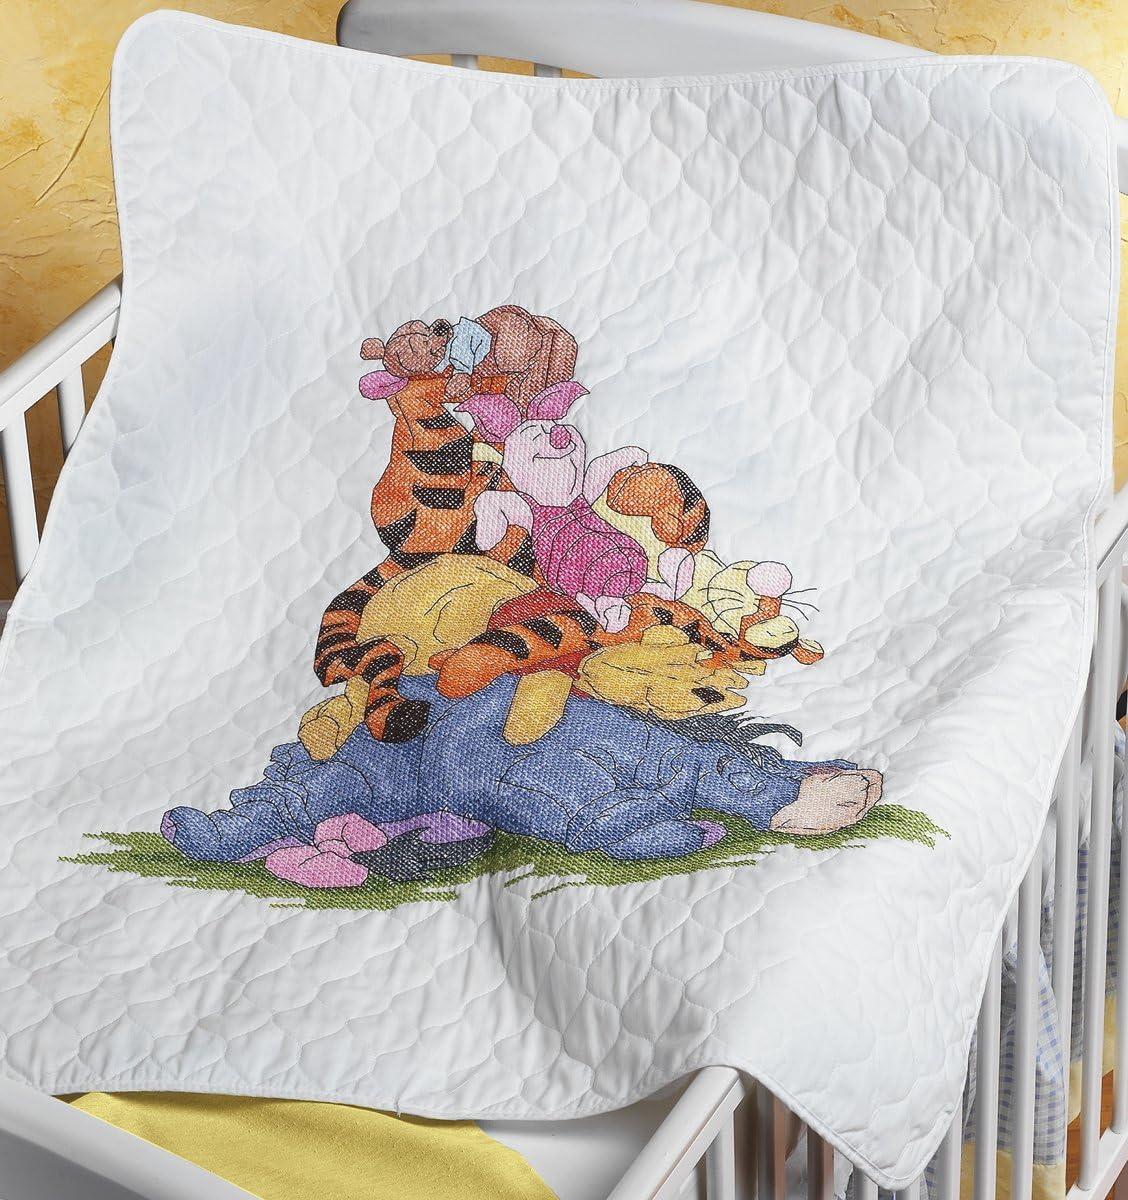 B001708ACW Janlynn Stamped Cross Stitch Kit, 43-1/2-Inch by 34-Inch, Snoozy Day Quilt 81nolEcx5KL.SL1200_